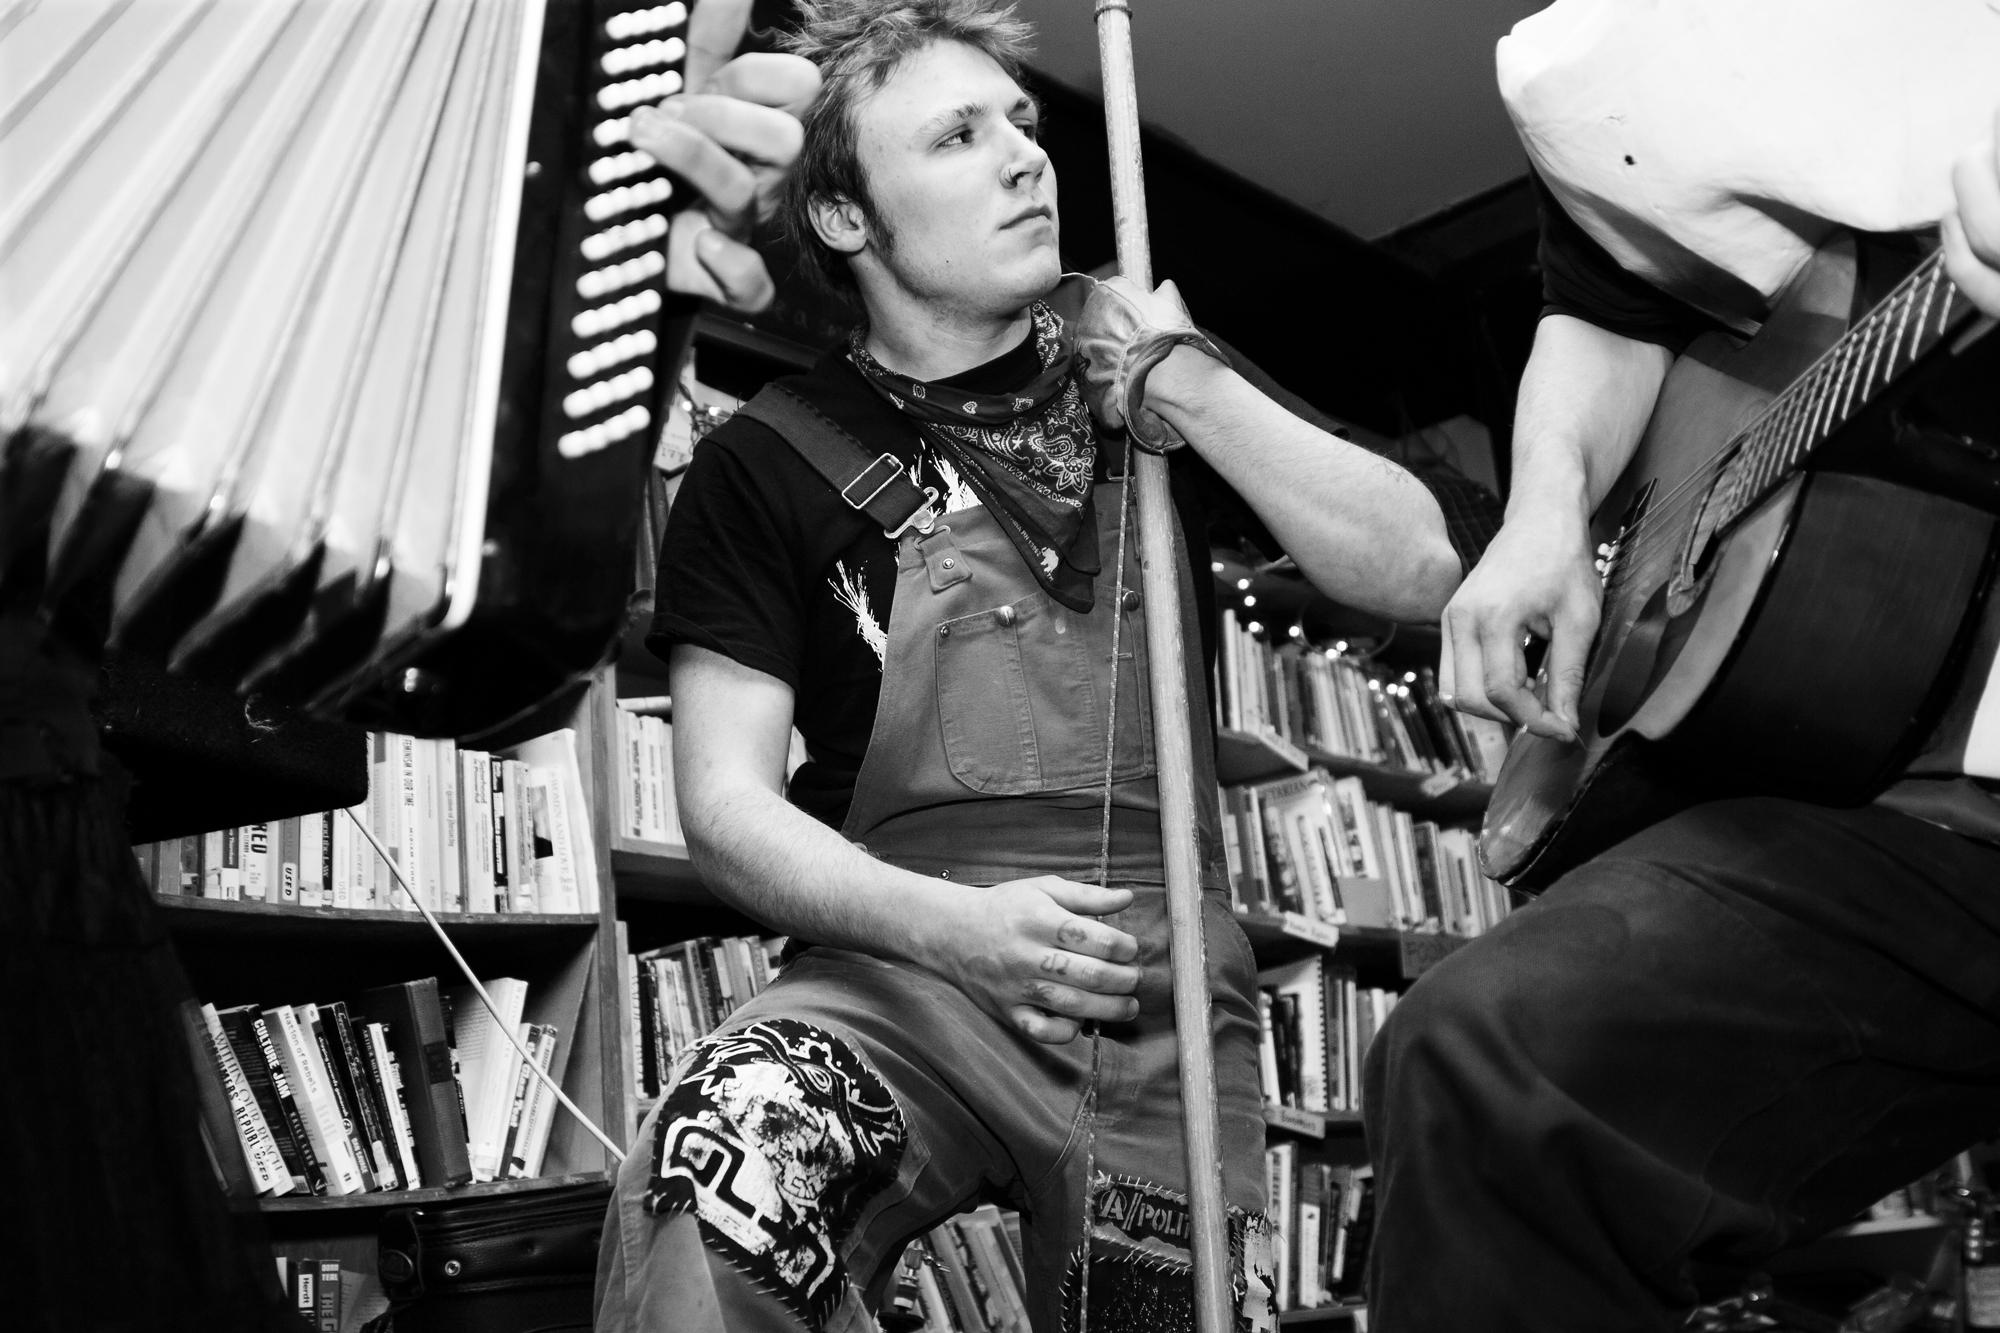 Jug band plays anarchist bookstore